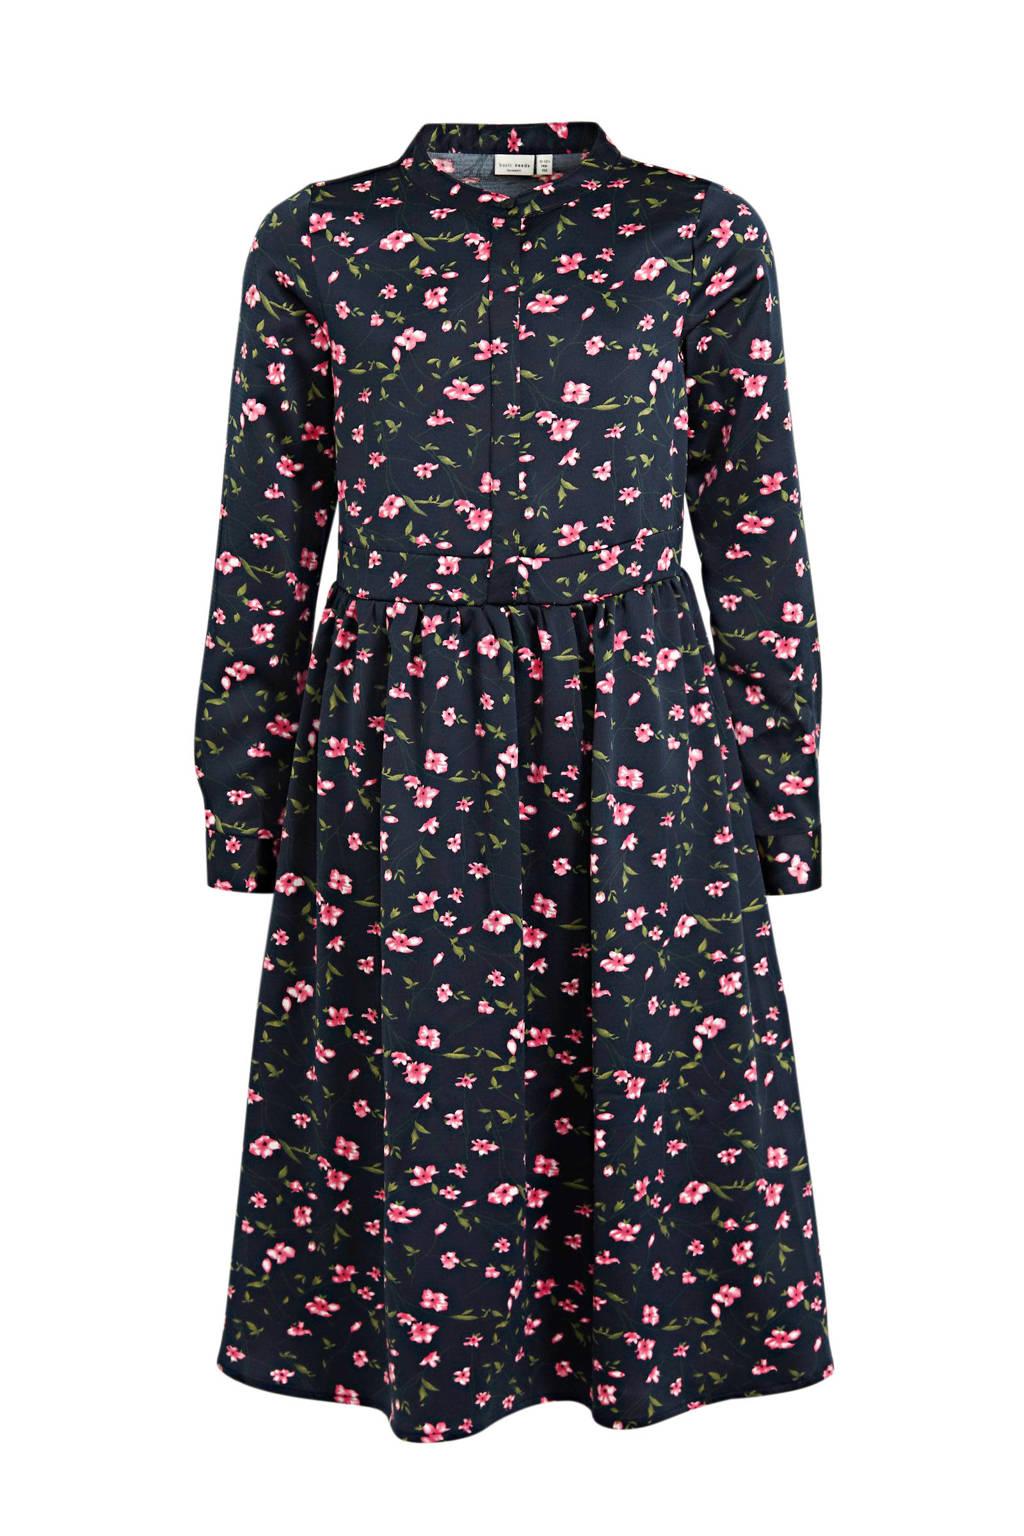 NAME IT KIDS maxi jurk Kaya met all over print en plooien donkerblauw/roze/groen